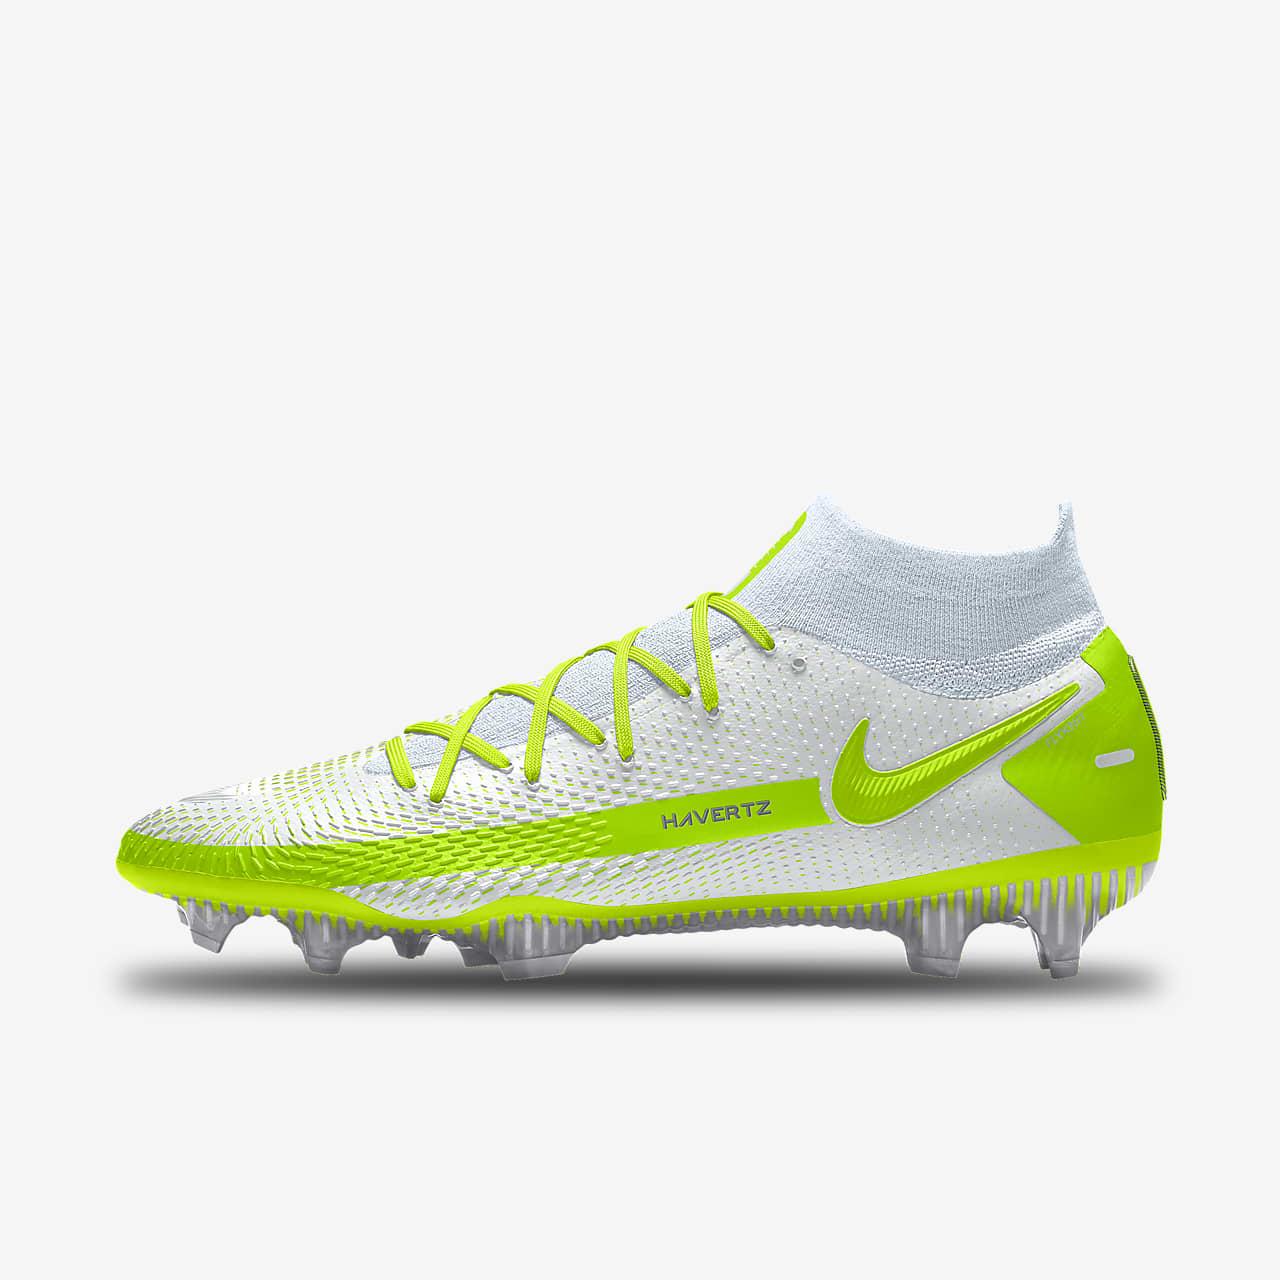 Nike Phantom GT Elite By You Custom Firm Ground Soccer Cleat